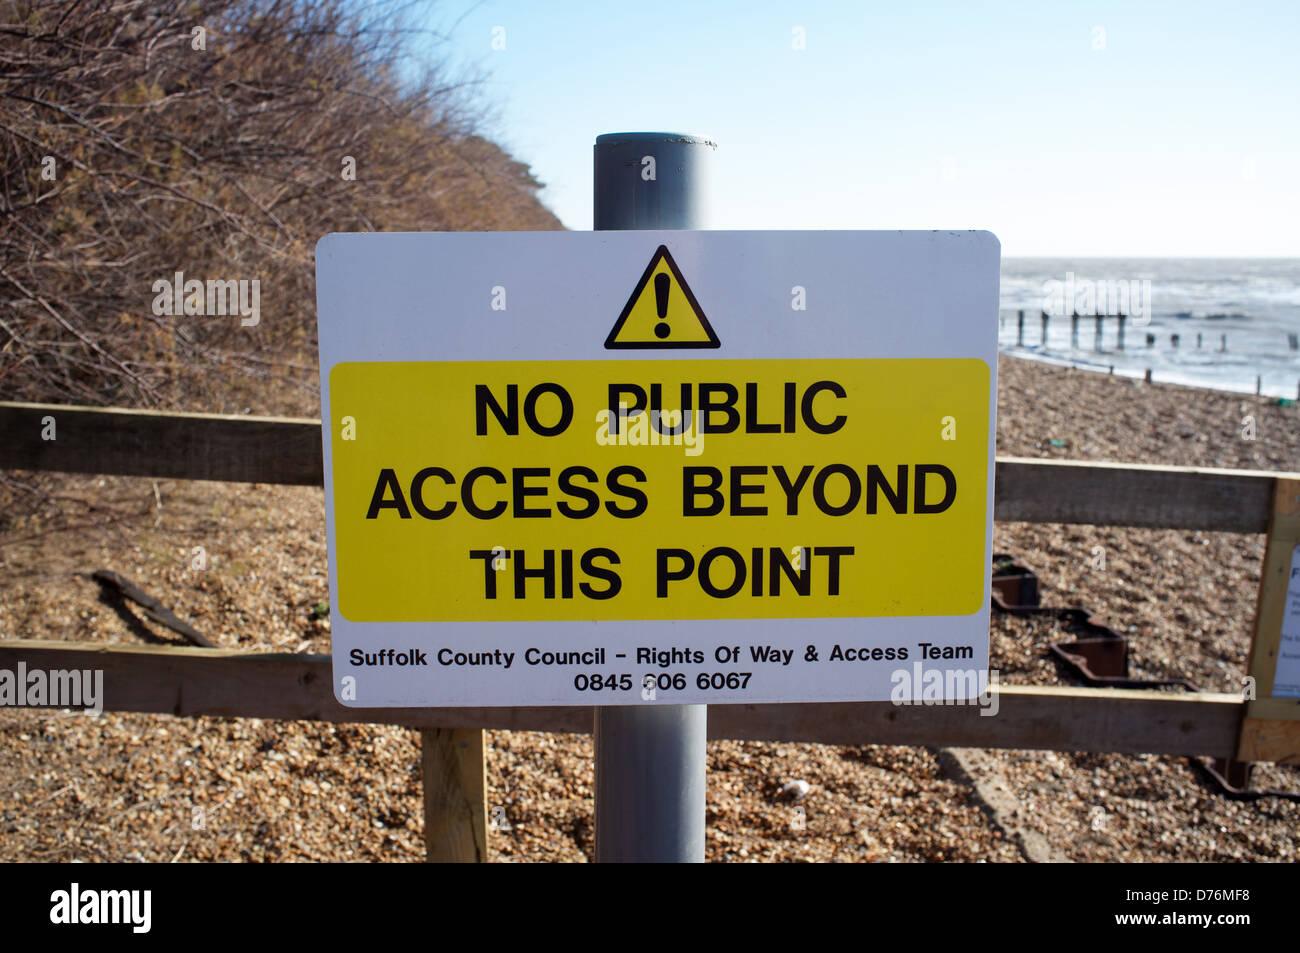 No public access sign due to coastal erosion - Stock Image